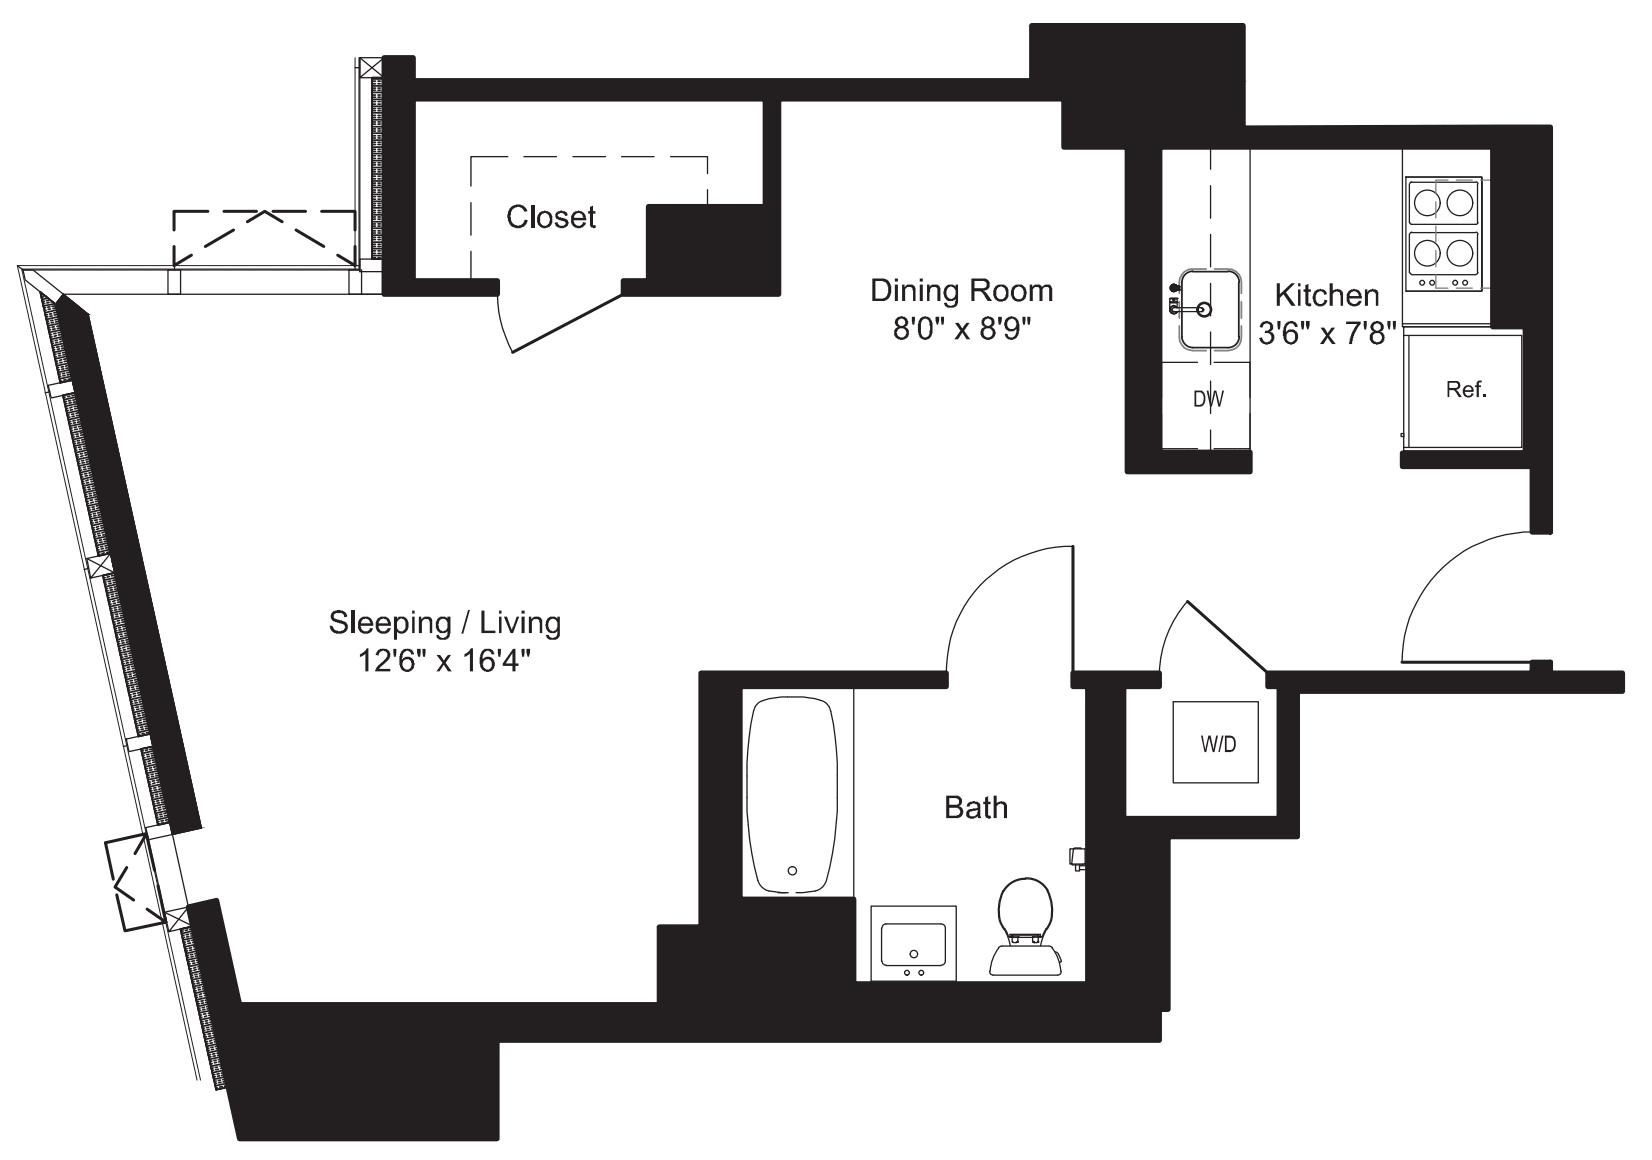 Studio B 20-22